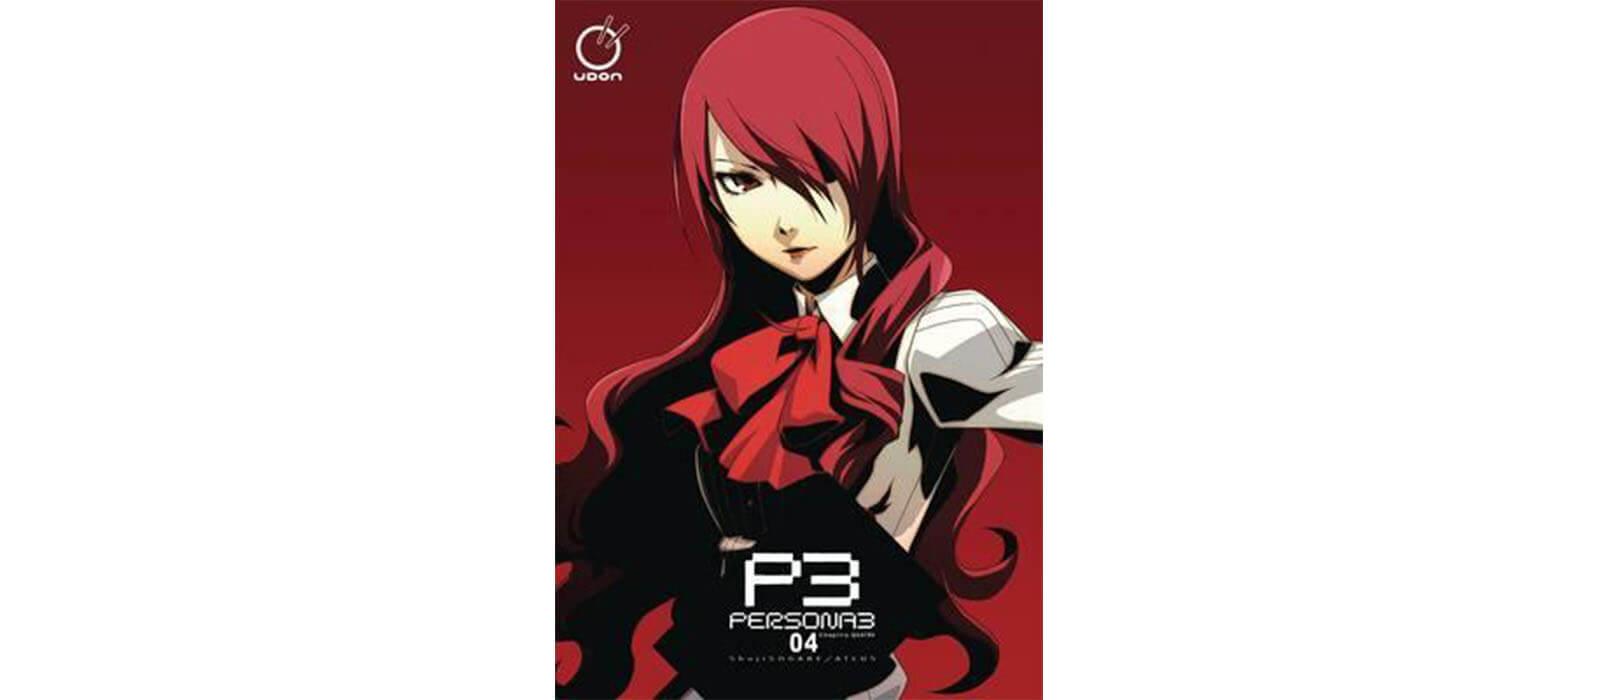 June 2017 Manga Releases - Persona 3 Volume 4